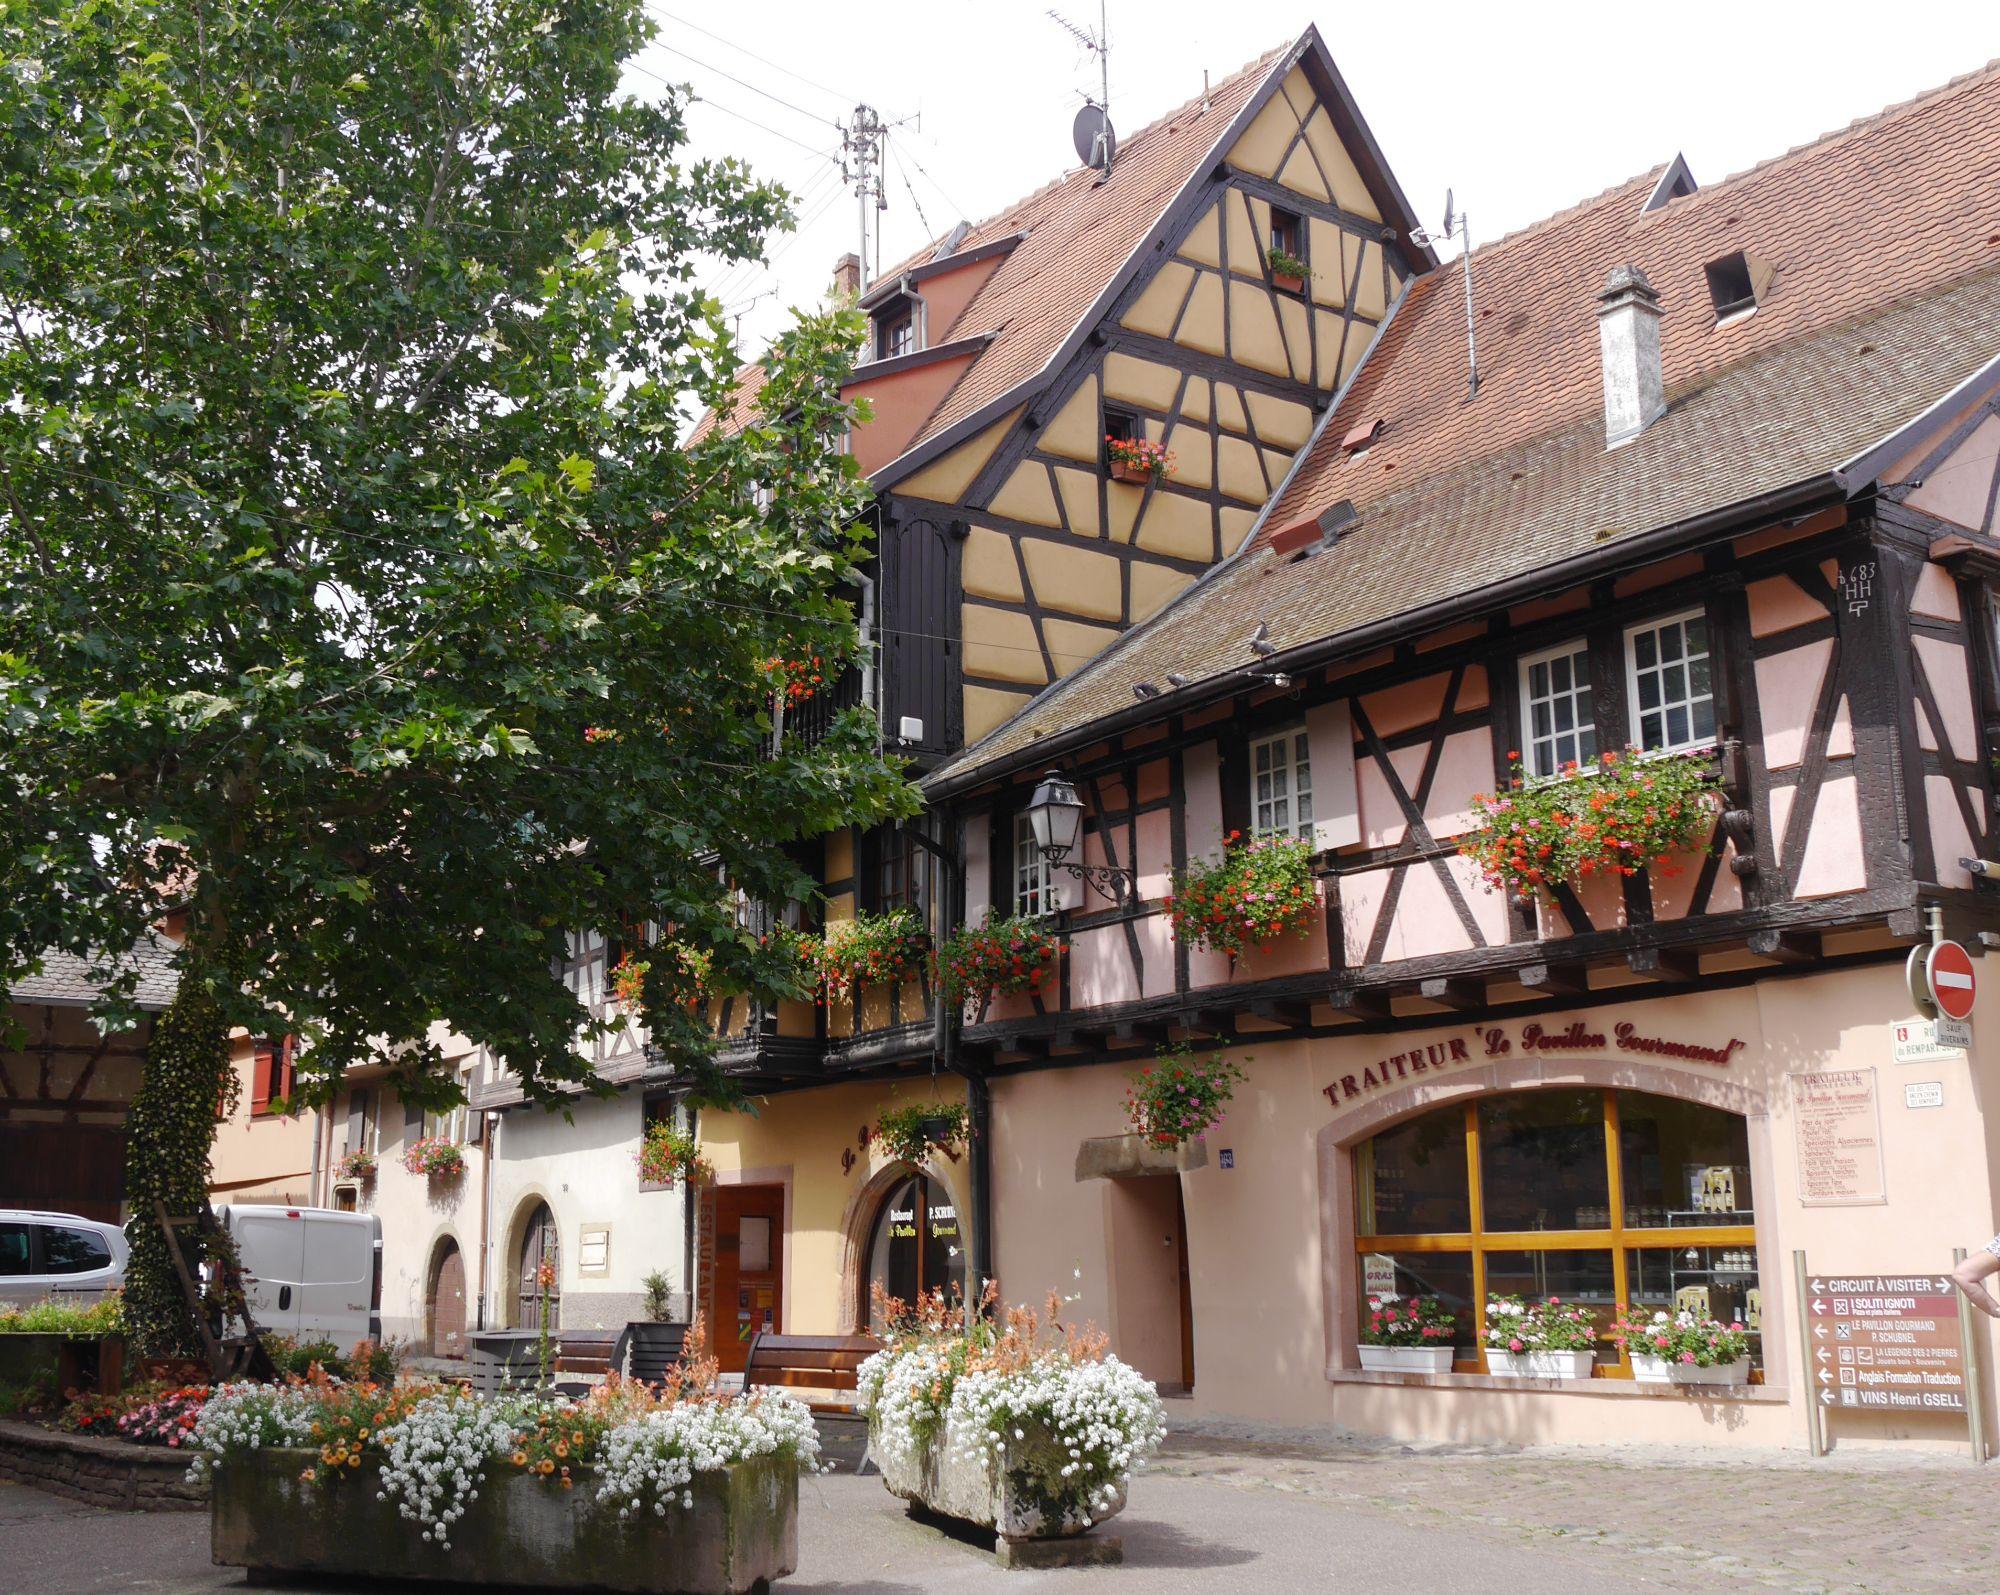 180624 Turckheim (14)